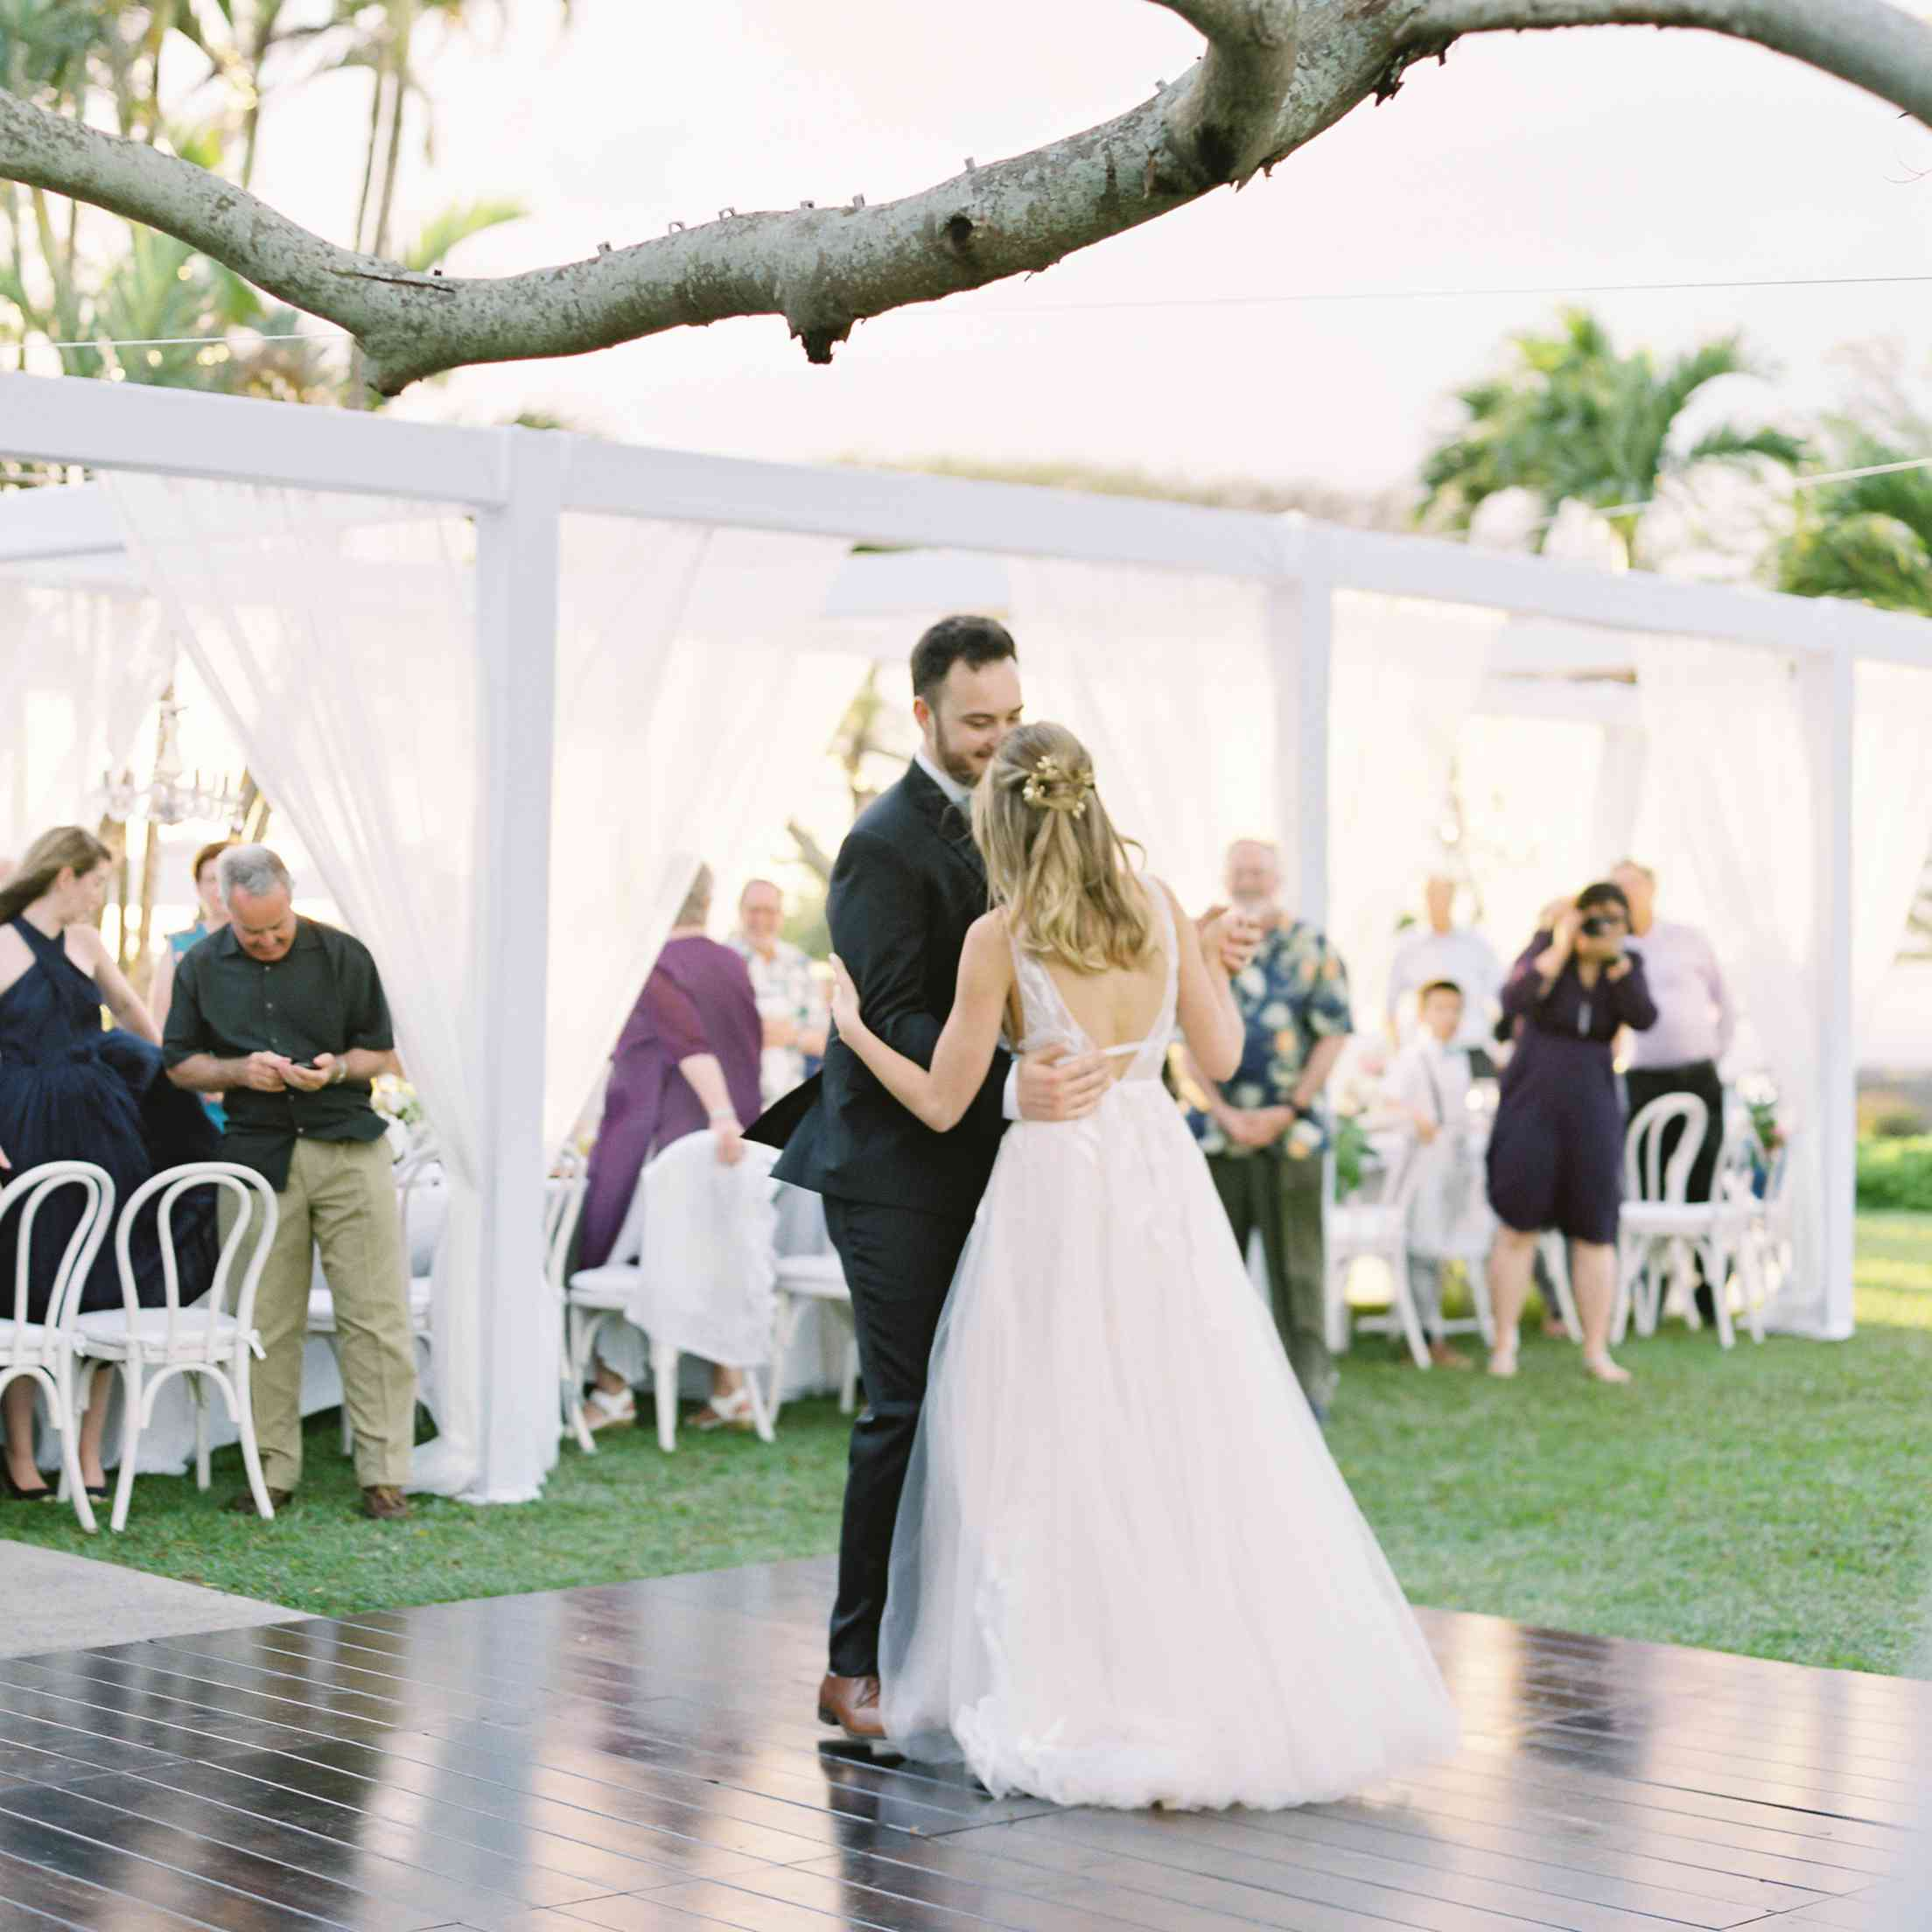 tropical maui wedding, bride and groom first dance